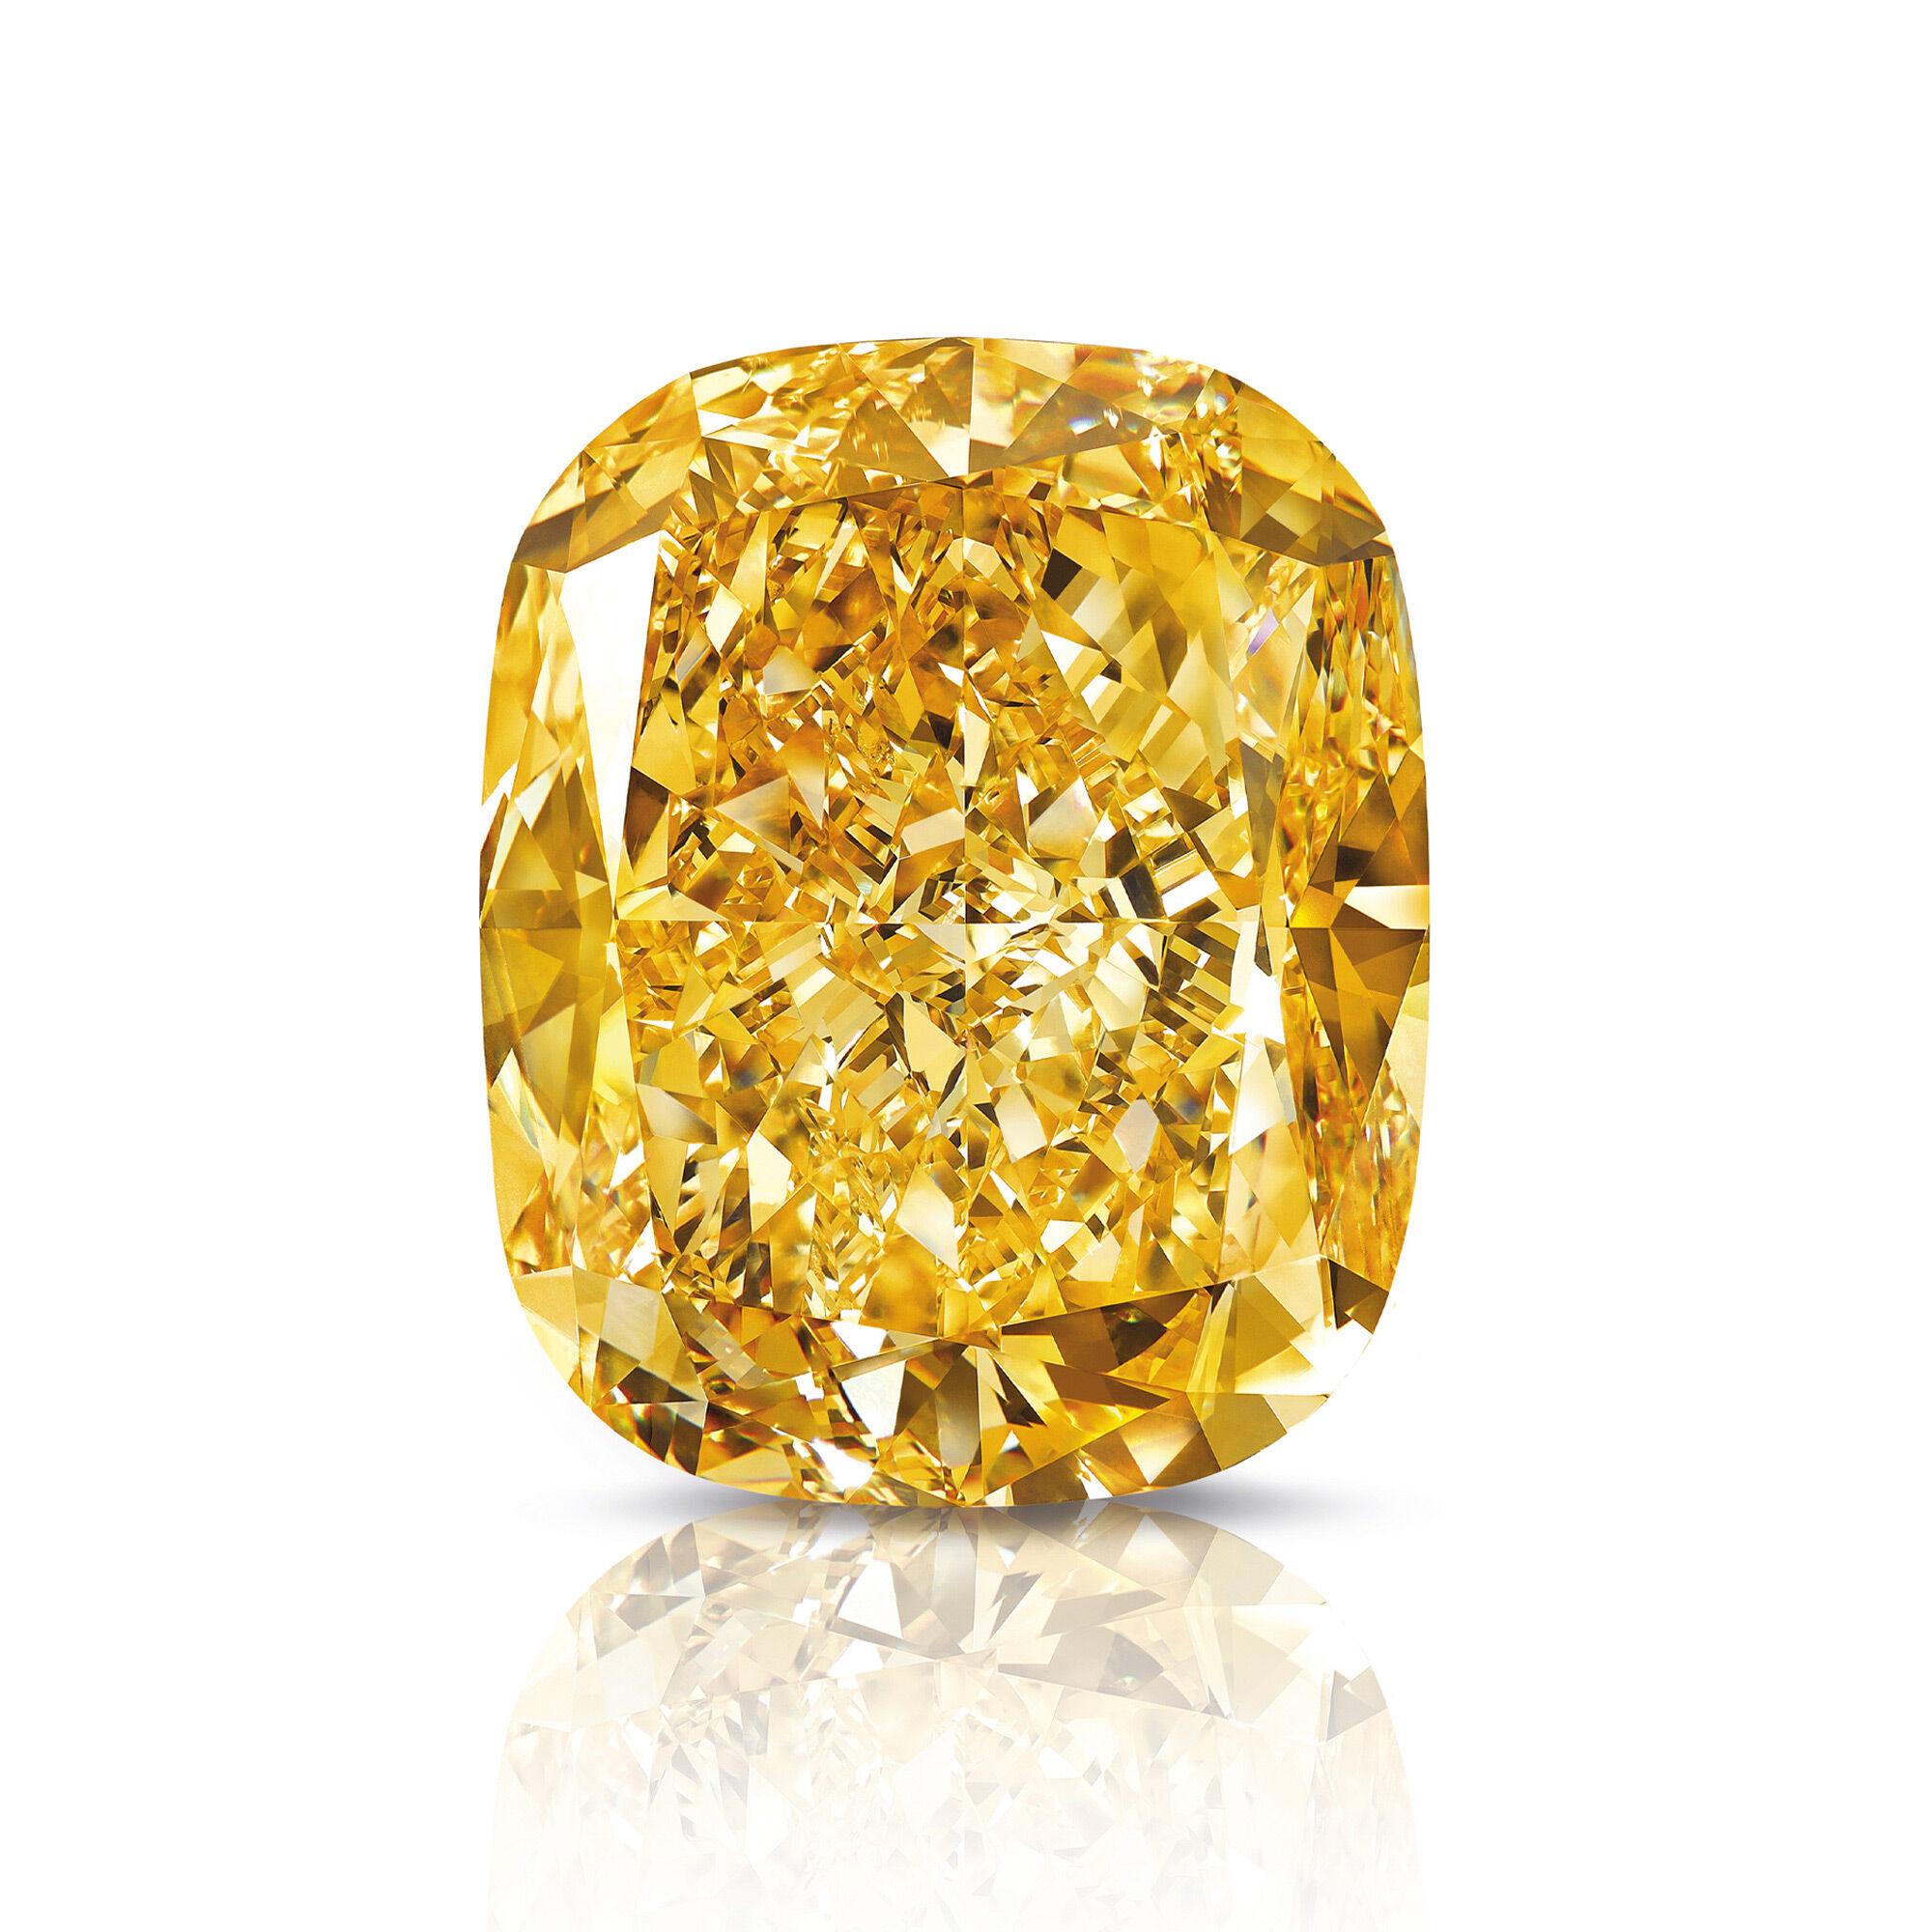 The Golden Empress famous diamond by Graff